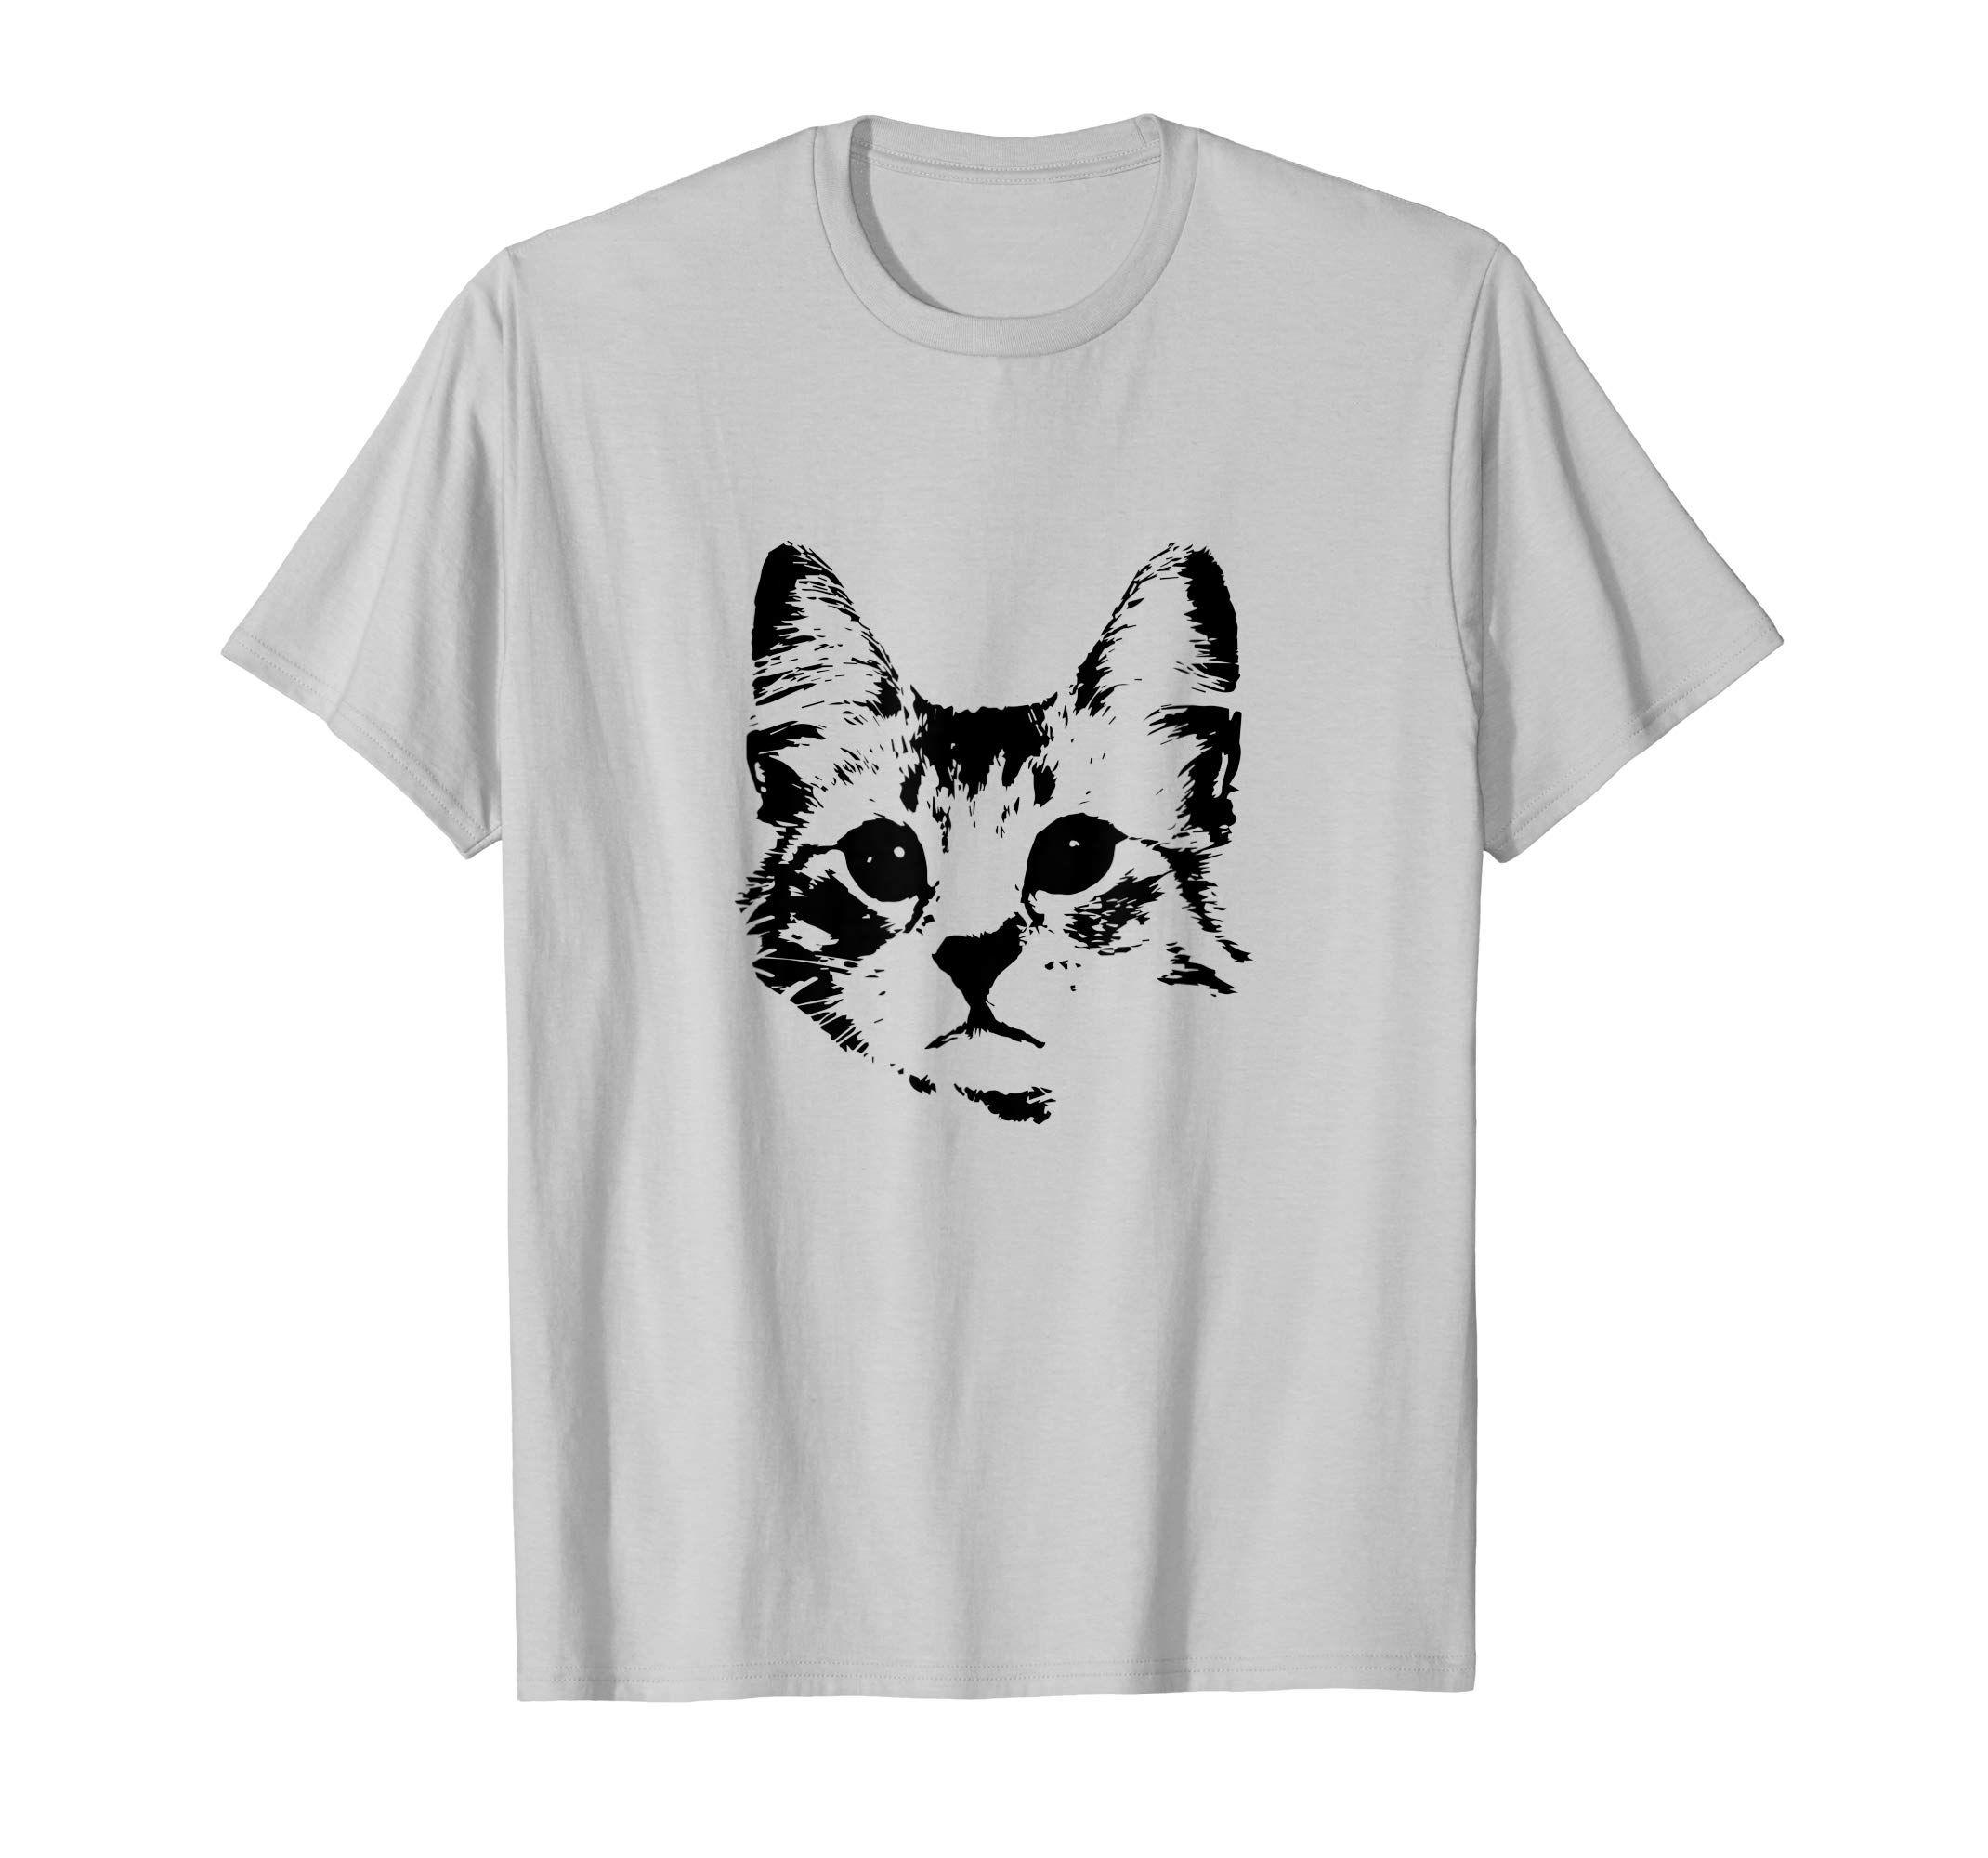 Amazon Com Cat T Shirt Cat Lover Tshirt Pet Animal Tee Kitten Kitty Clothing Cat Lover Tshirt Cool T Shirts Cat Tshirt